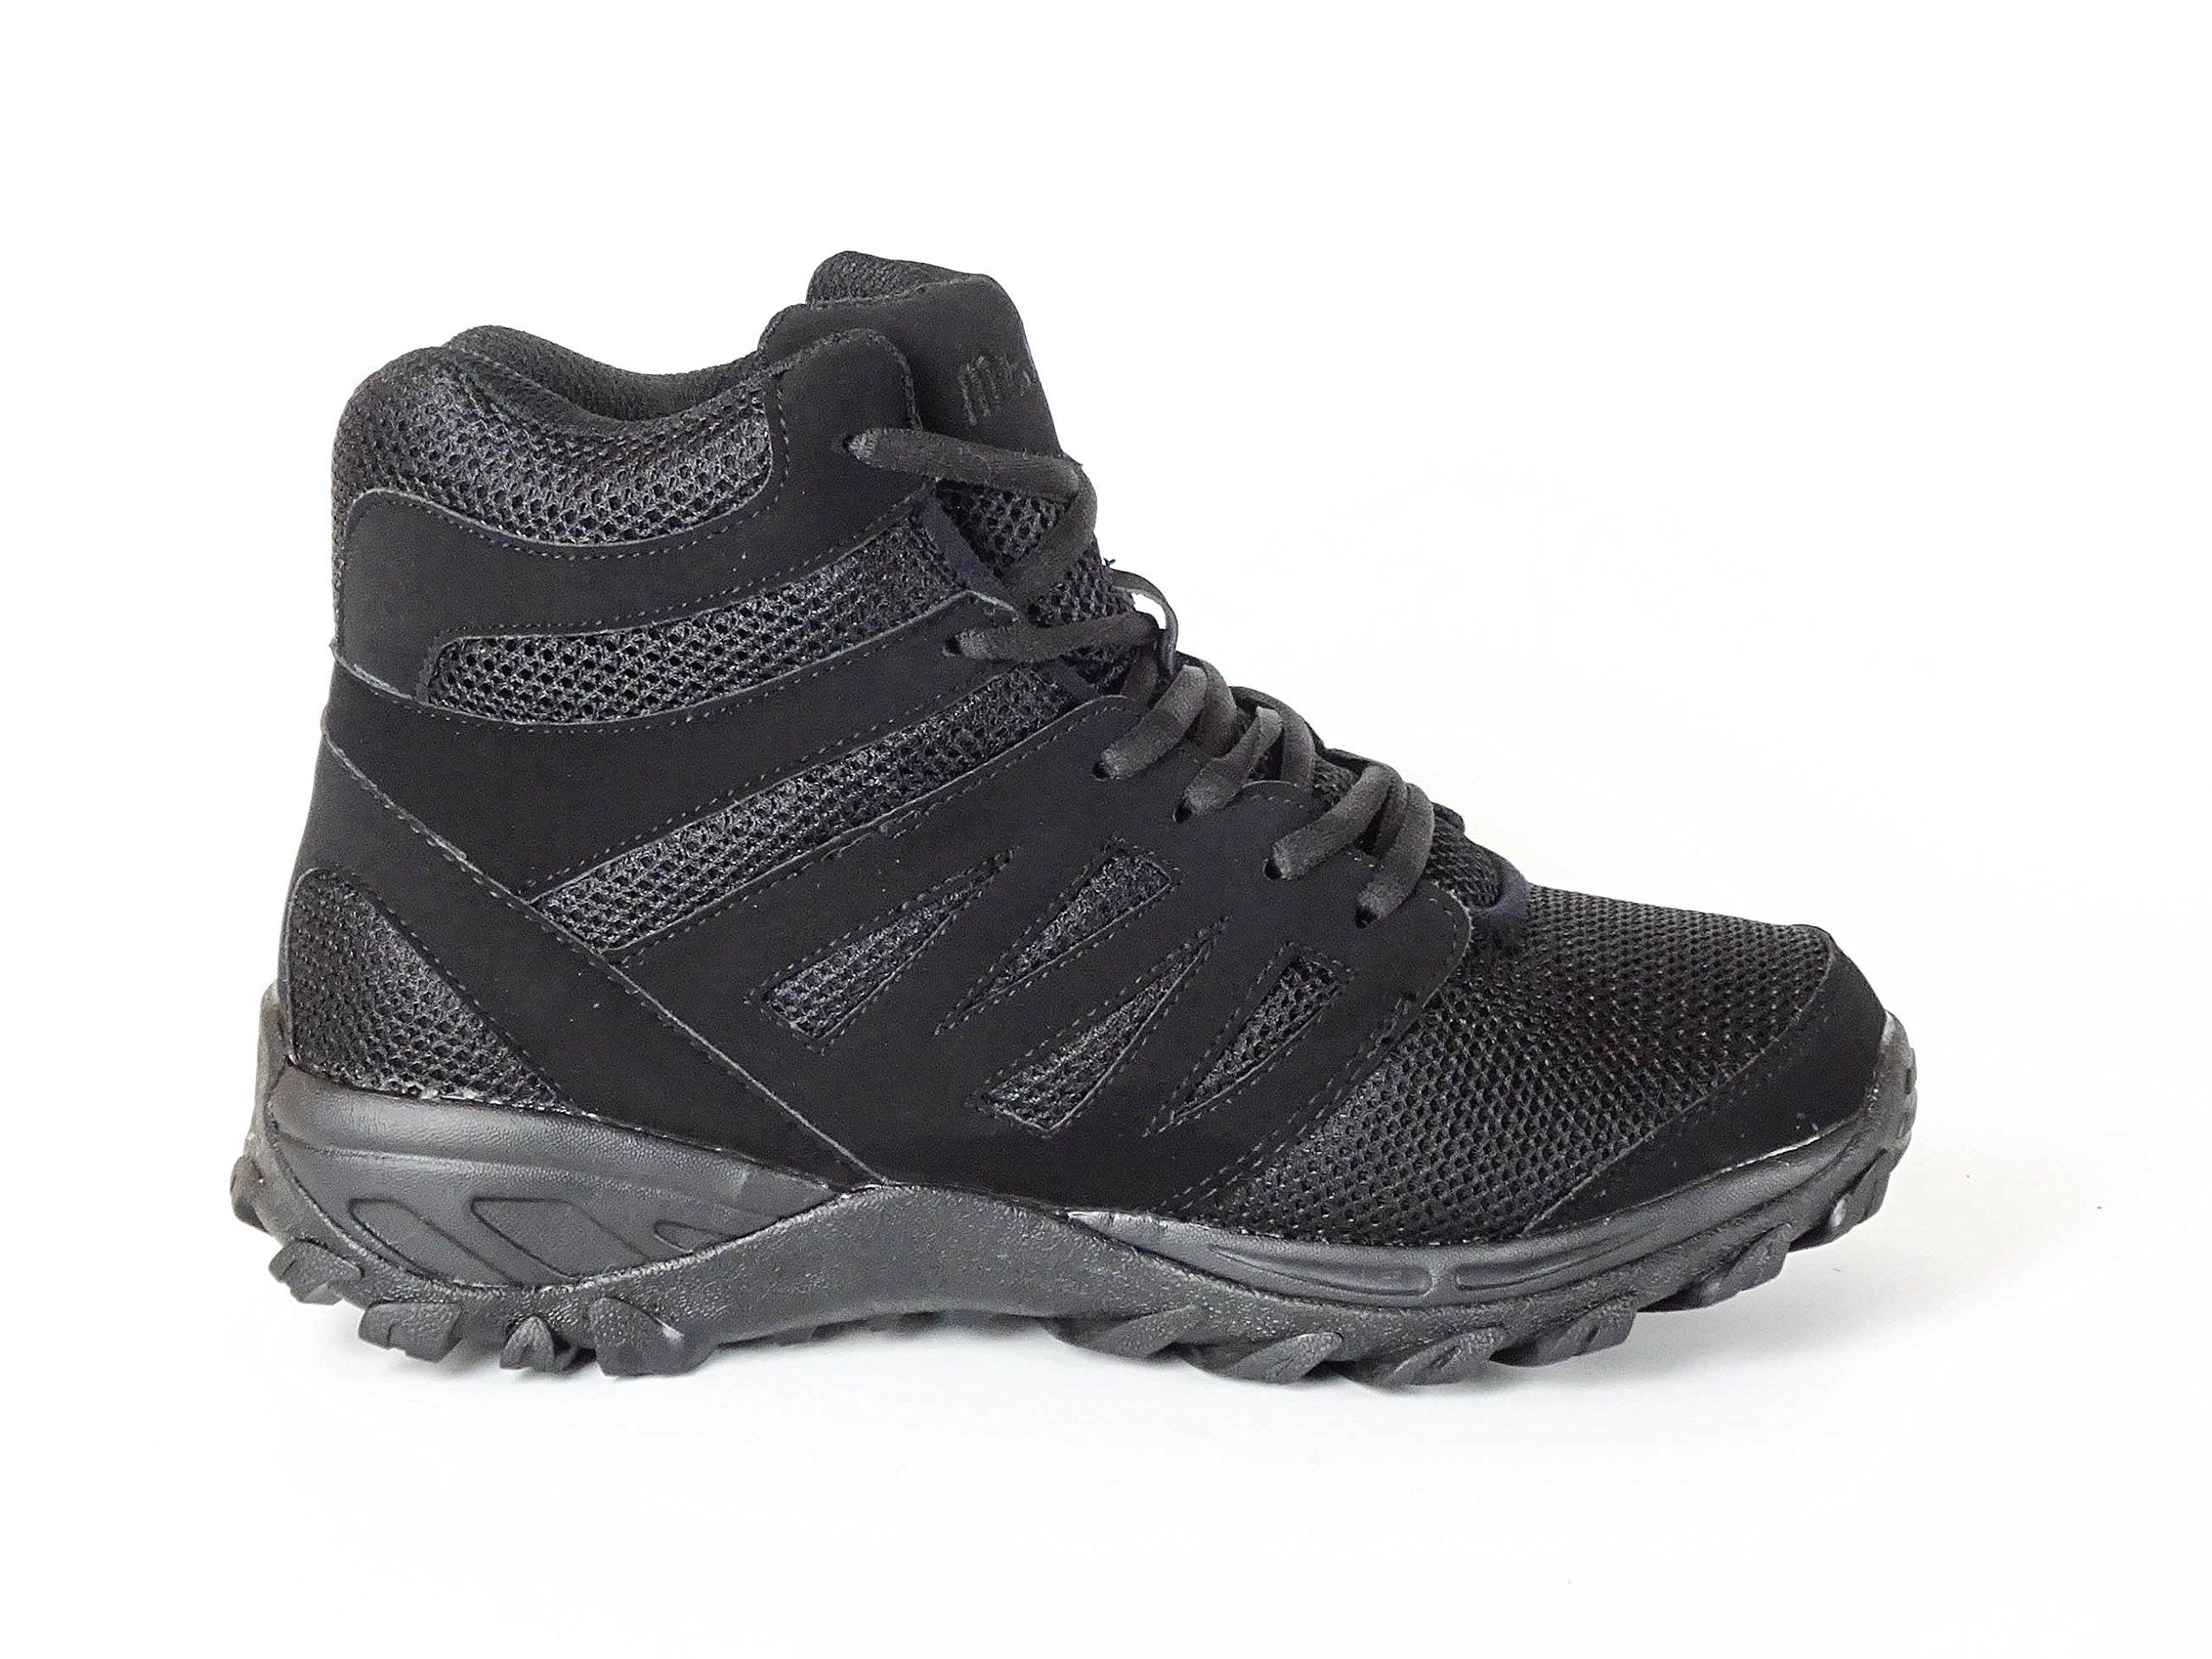 Mt. Emey 9713 Men's Atheletic Walking Boot Lace Black